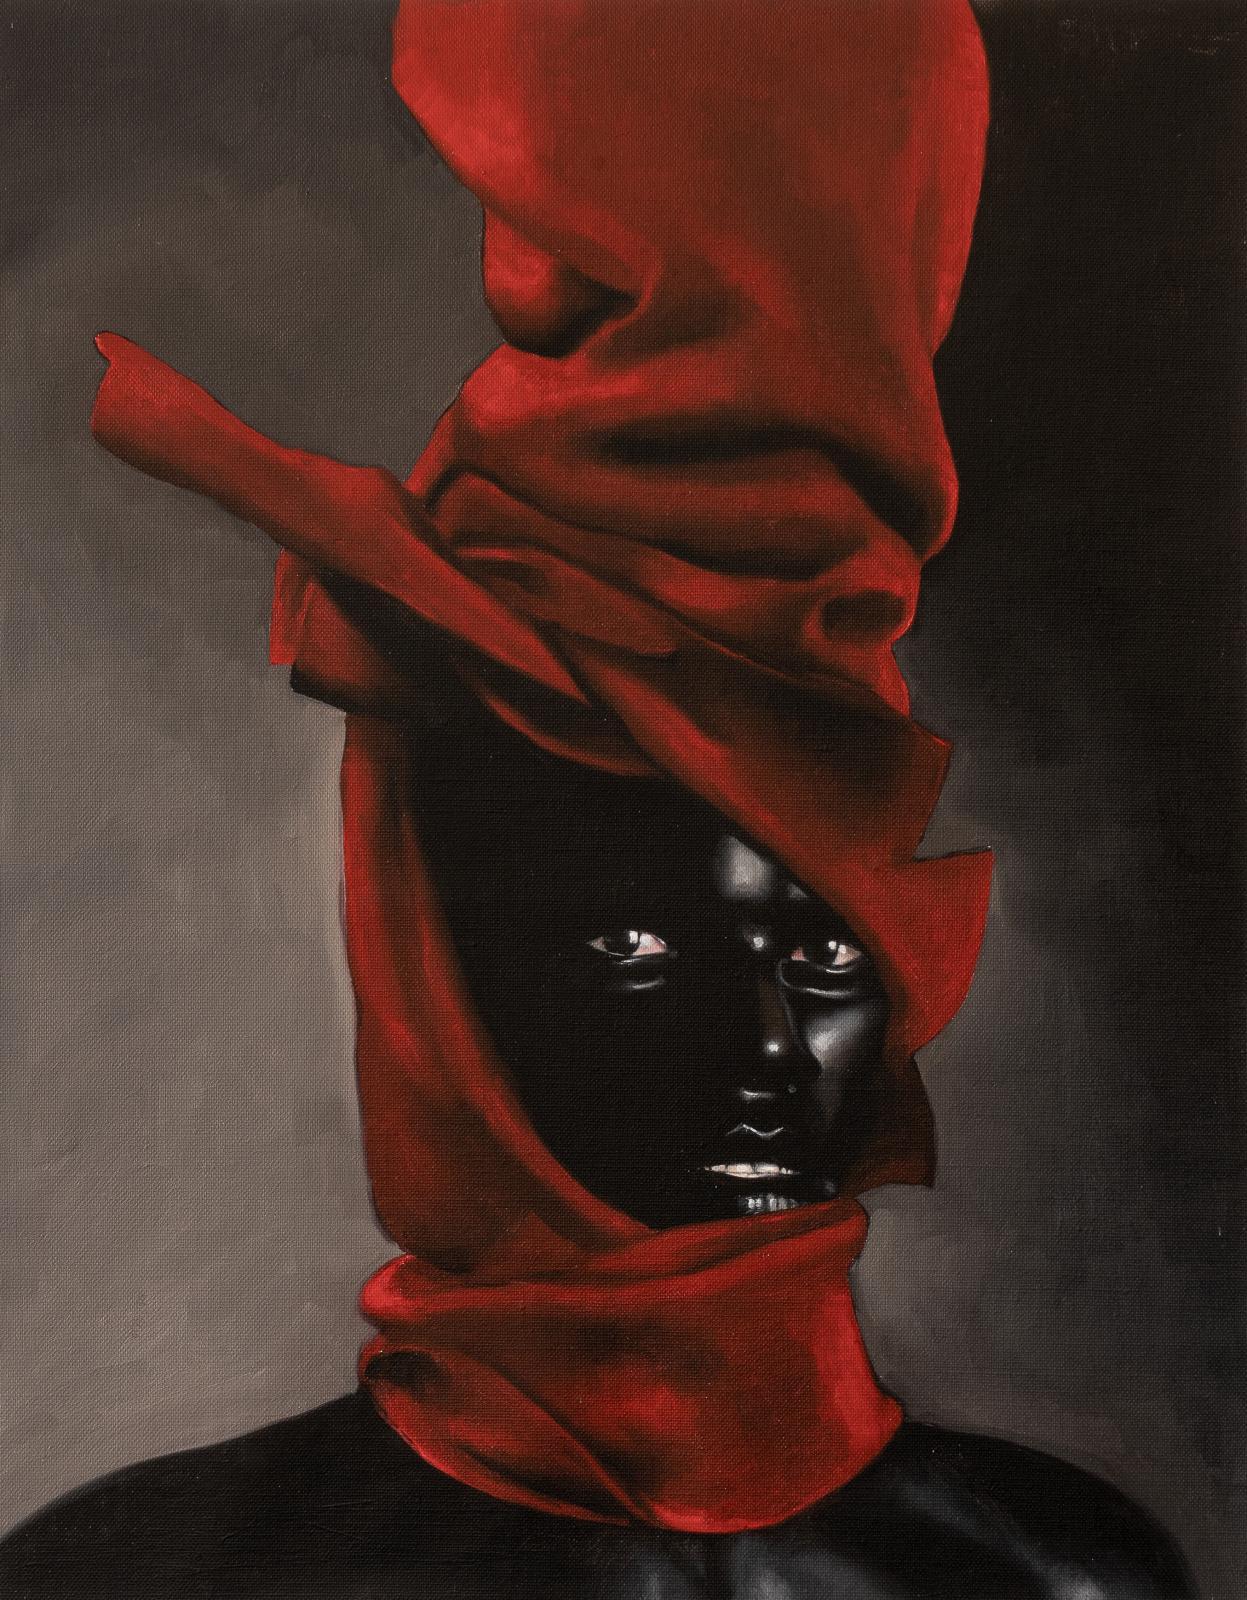 Gustavo Nazareno, Exu, 2021, oil on canvas, 72 x 58 cm/ 28.3 x 22.83 inch.© Gustavo Nazareno, Gallery 1957